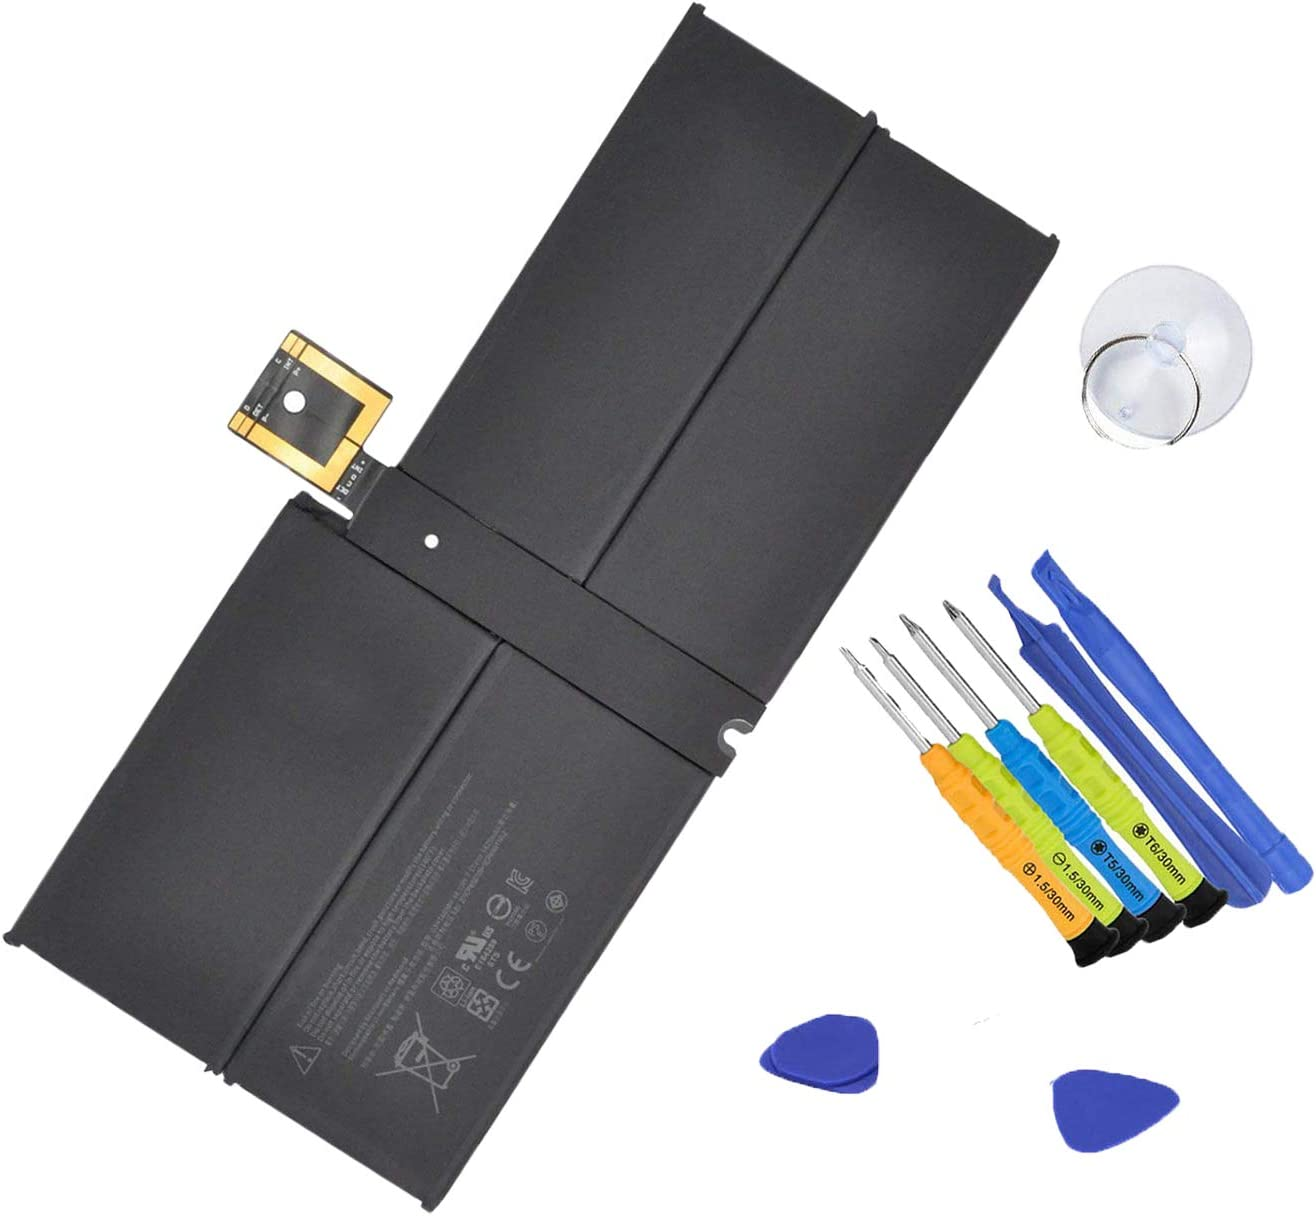 Bateria G3HTA038H para Microsoft Surface Pro 5 1796 -5940mAh